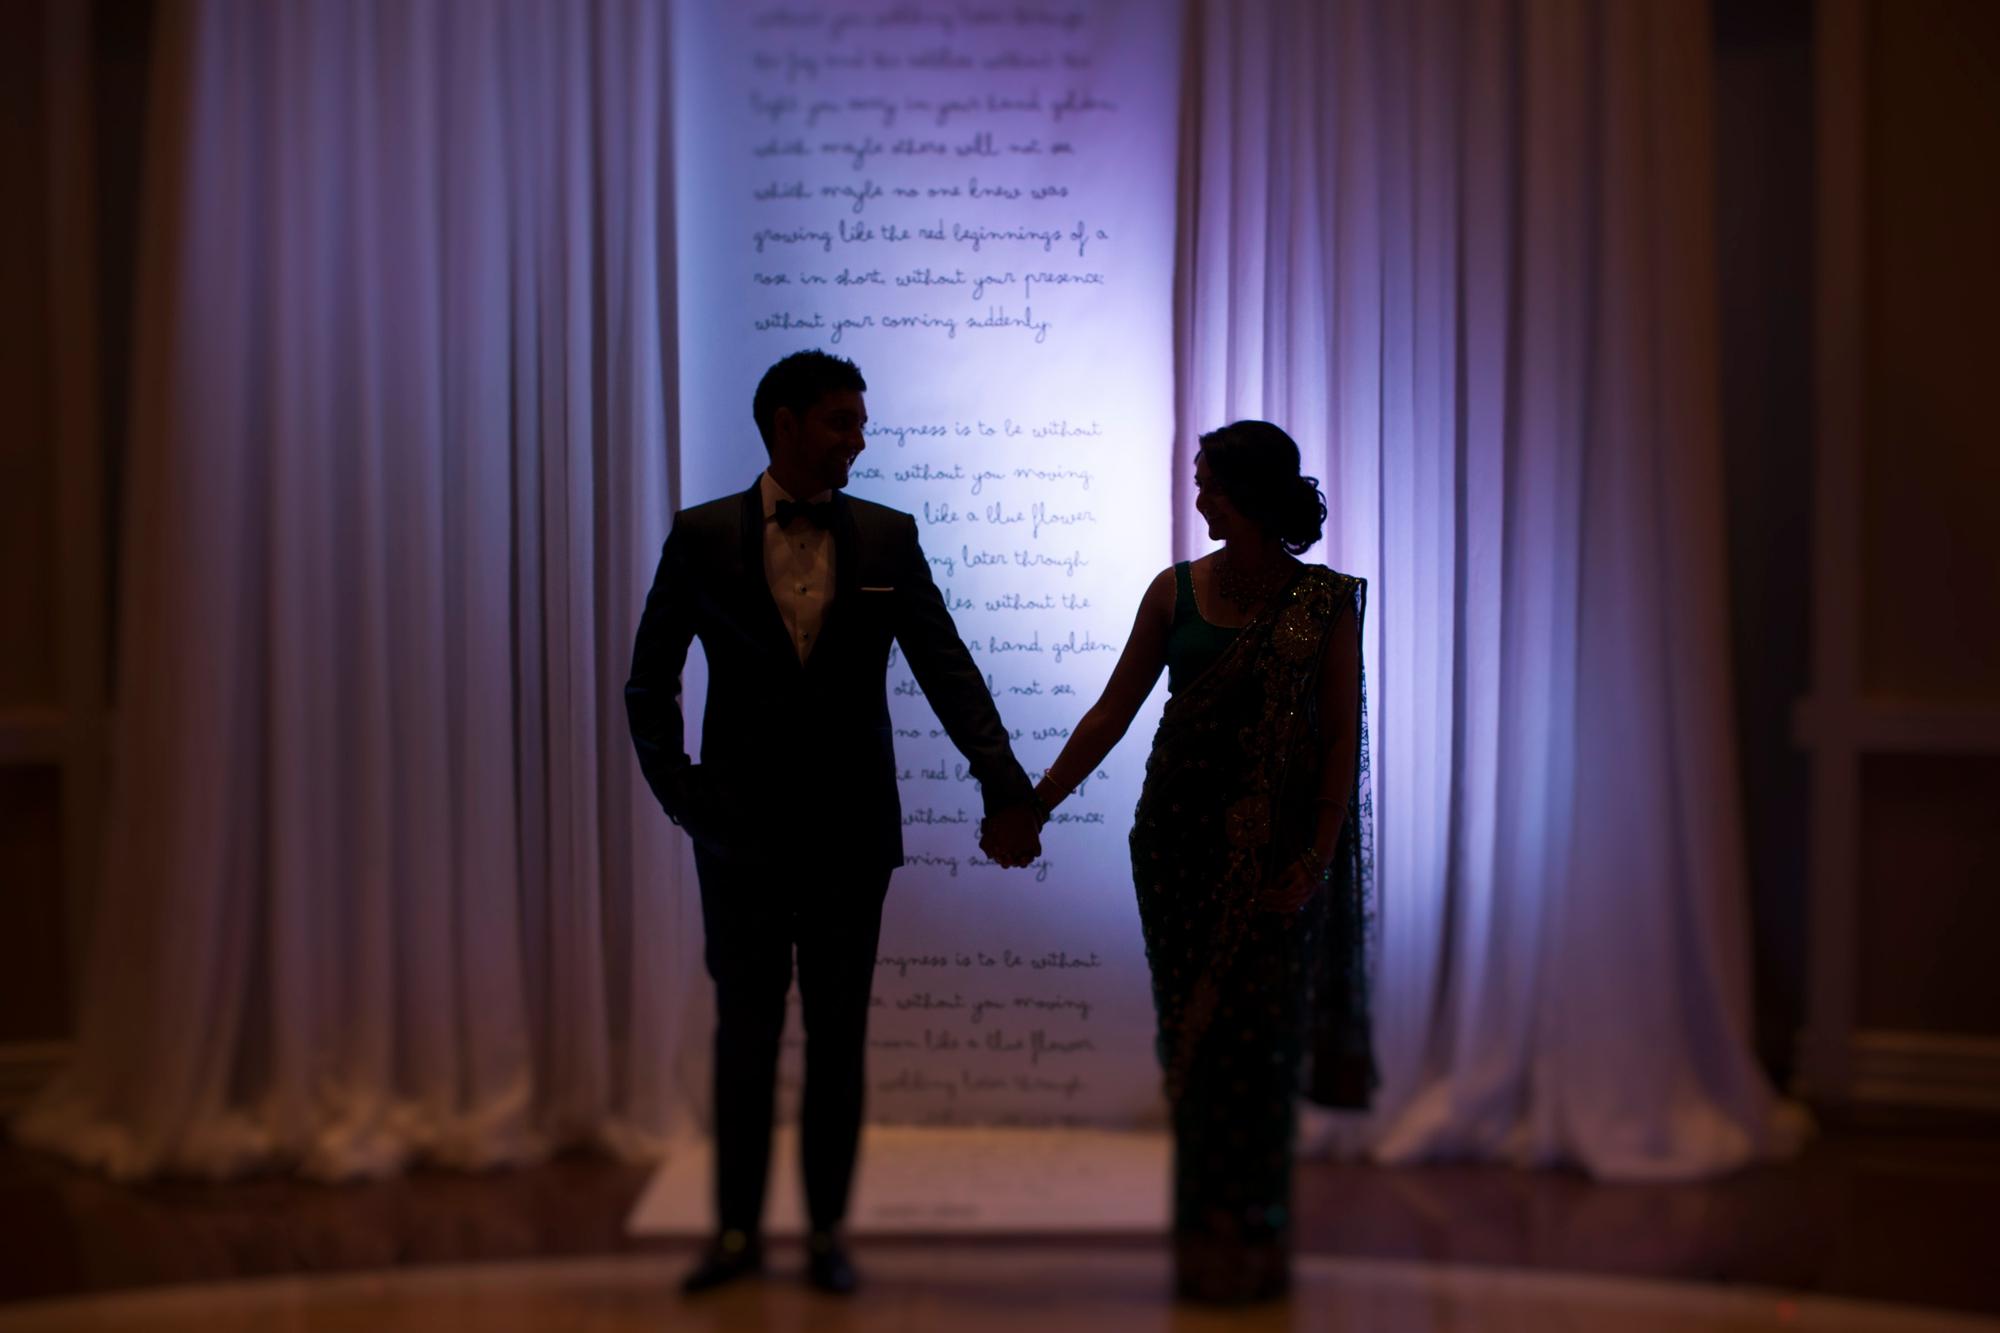 edmonton calgary alberta wedding photographer 1.jpg